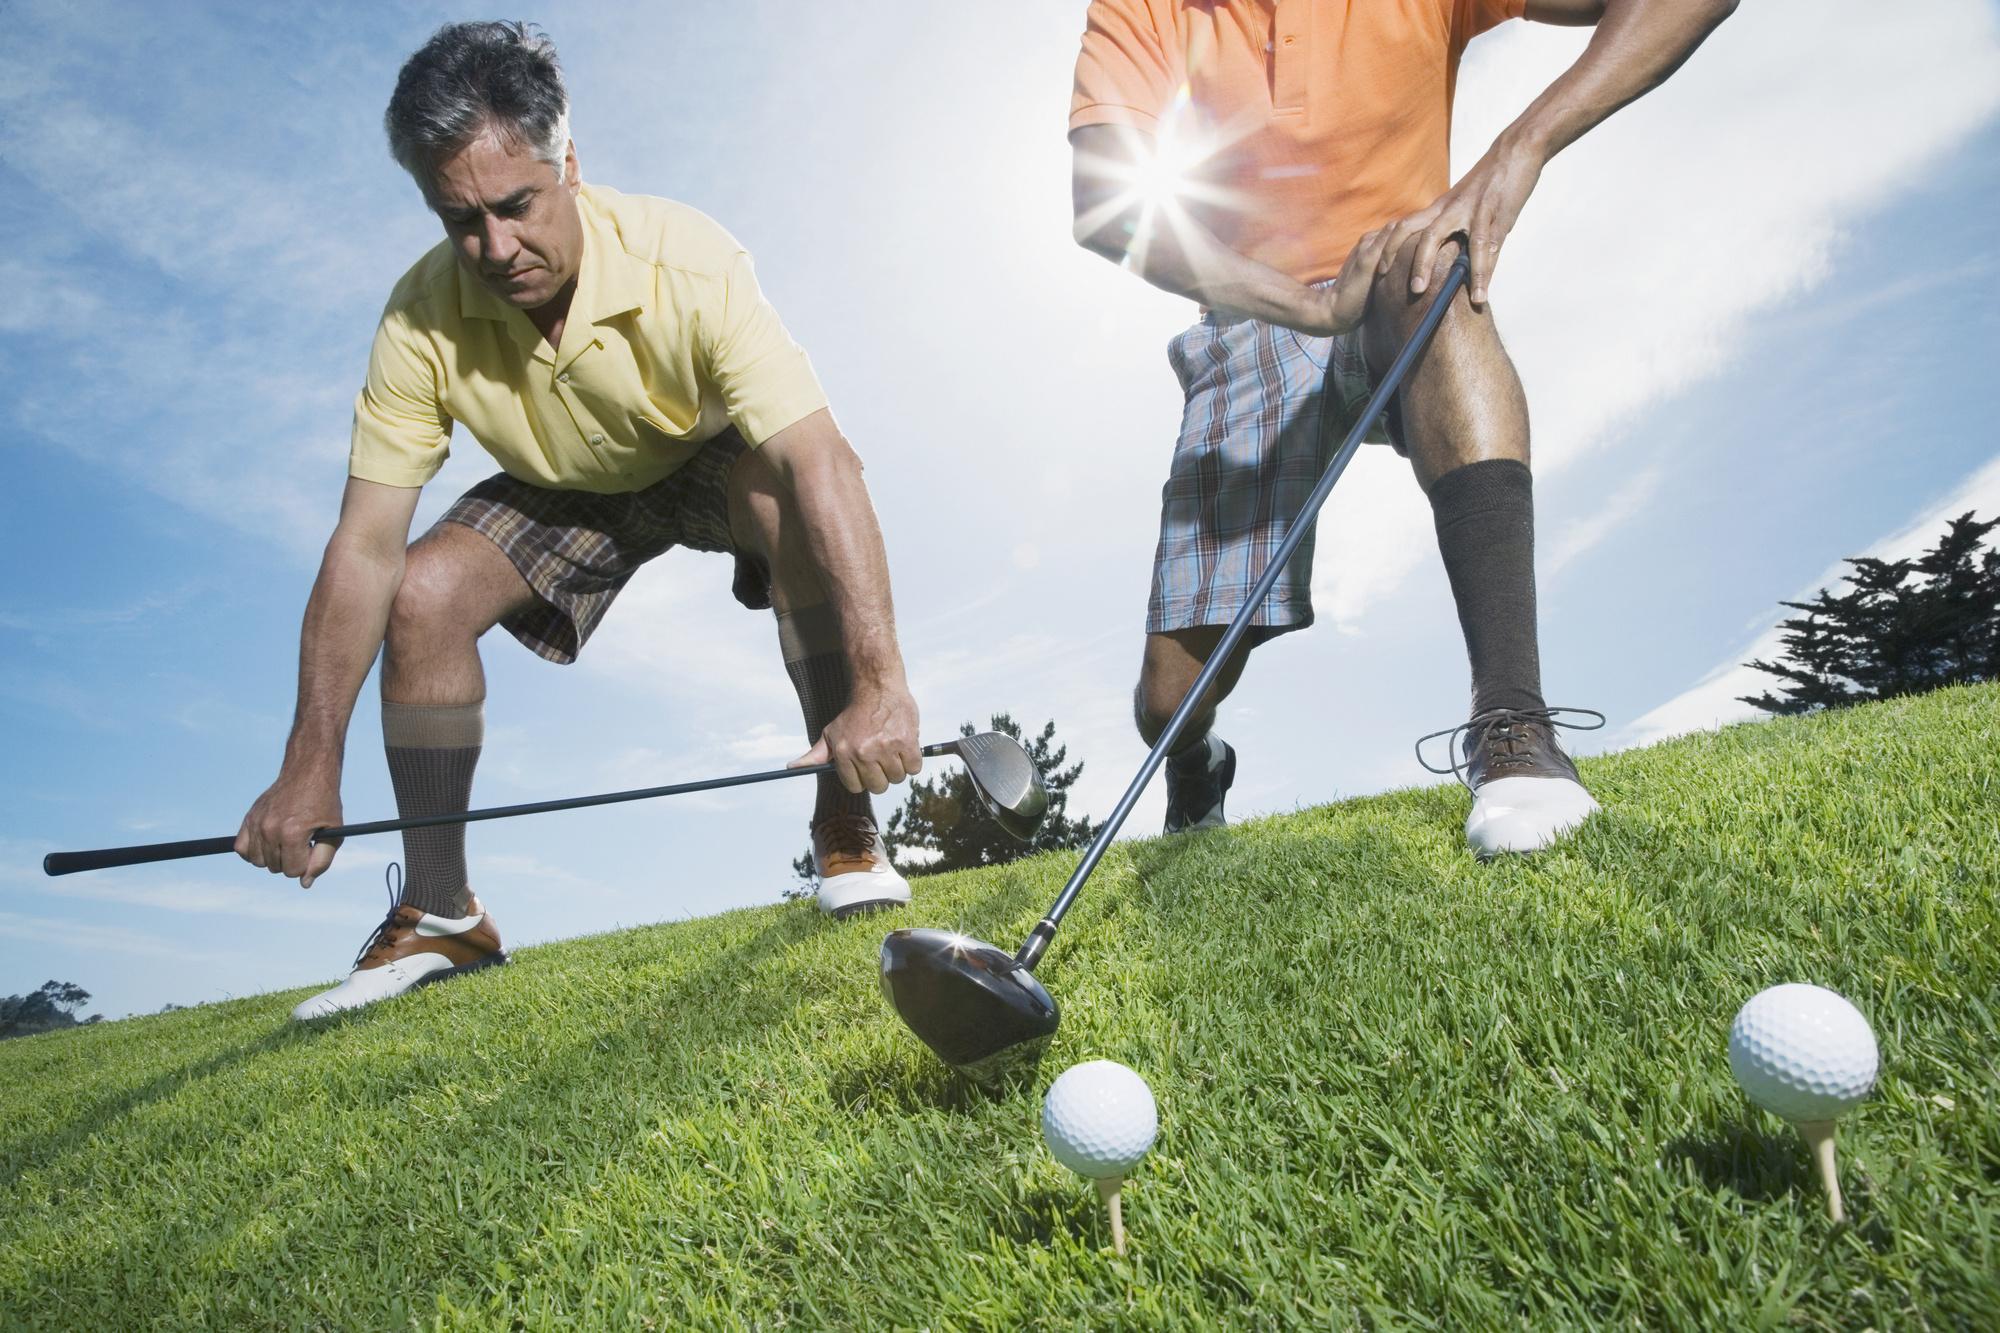 Pre Golf Stretches – Golf Stretching